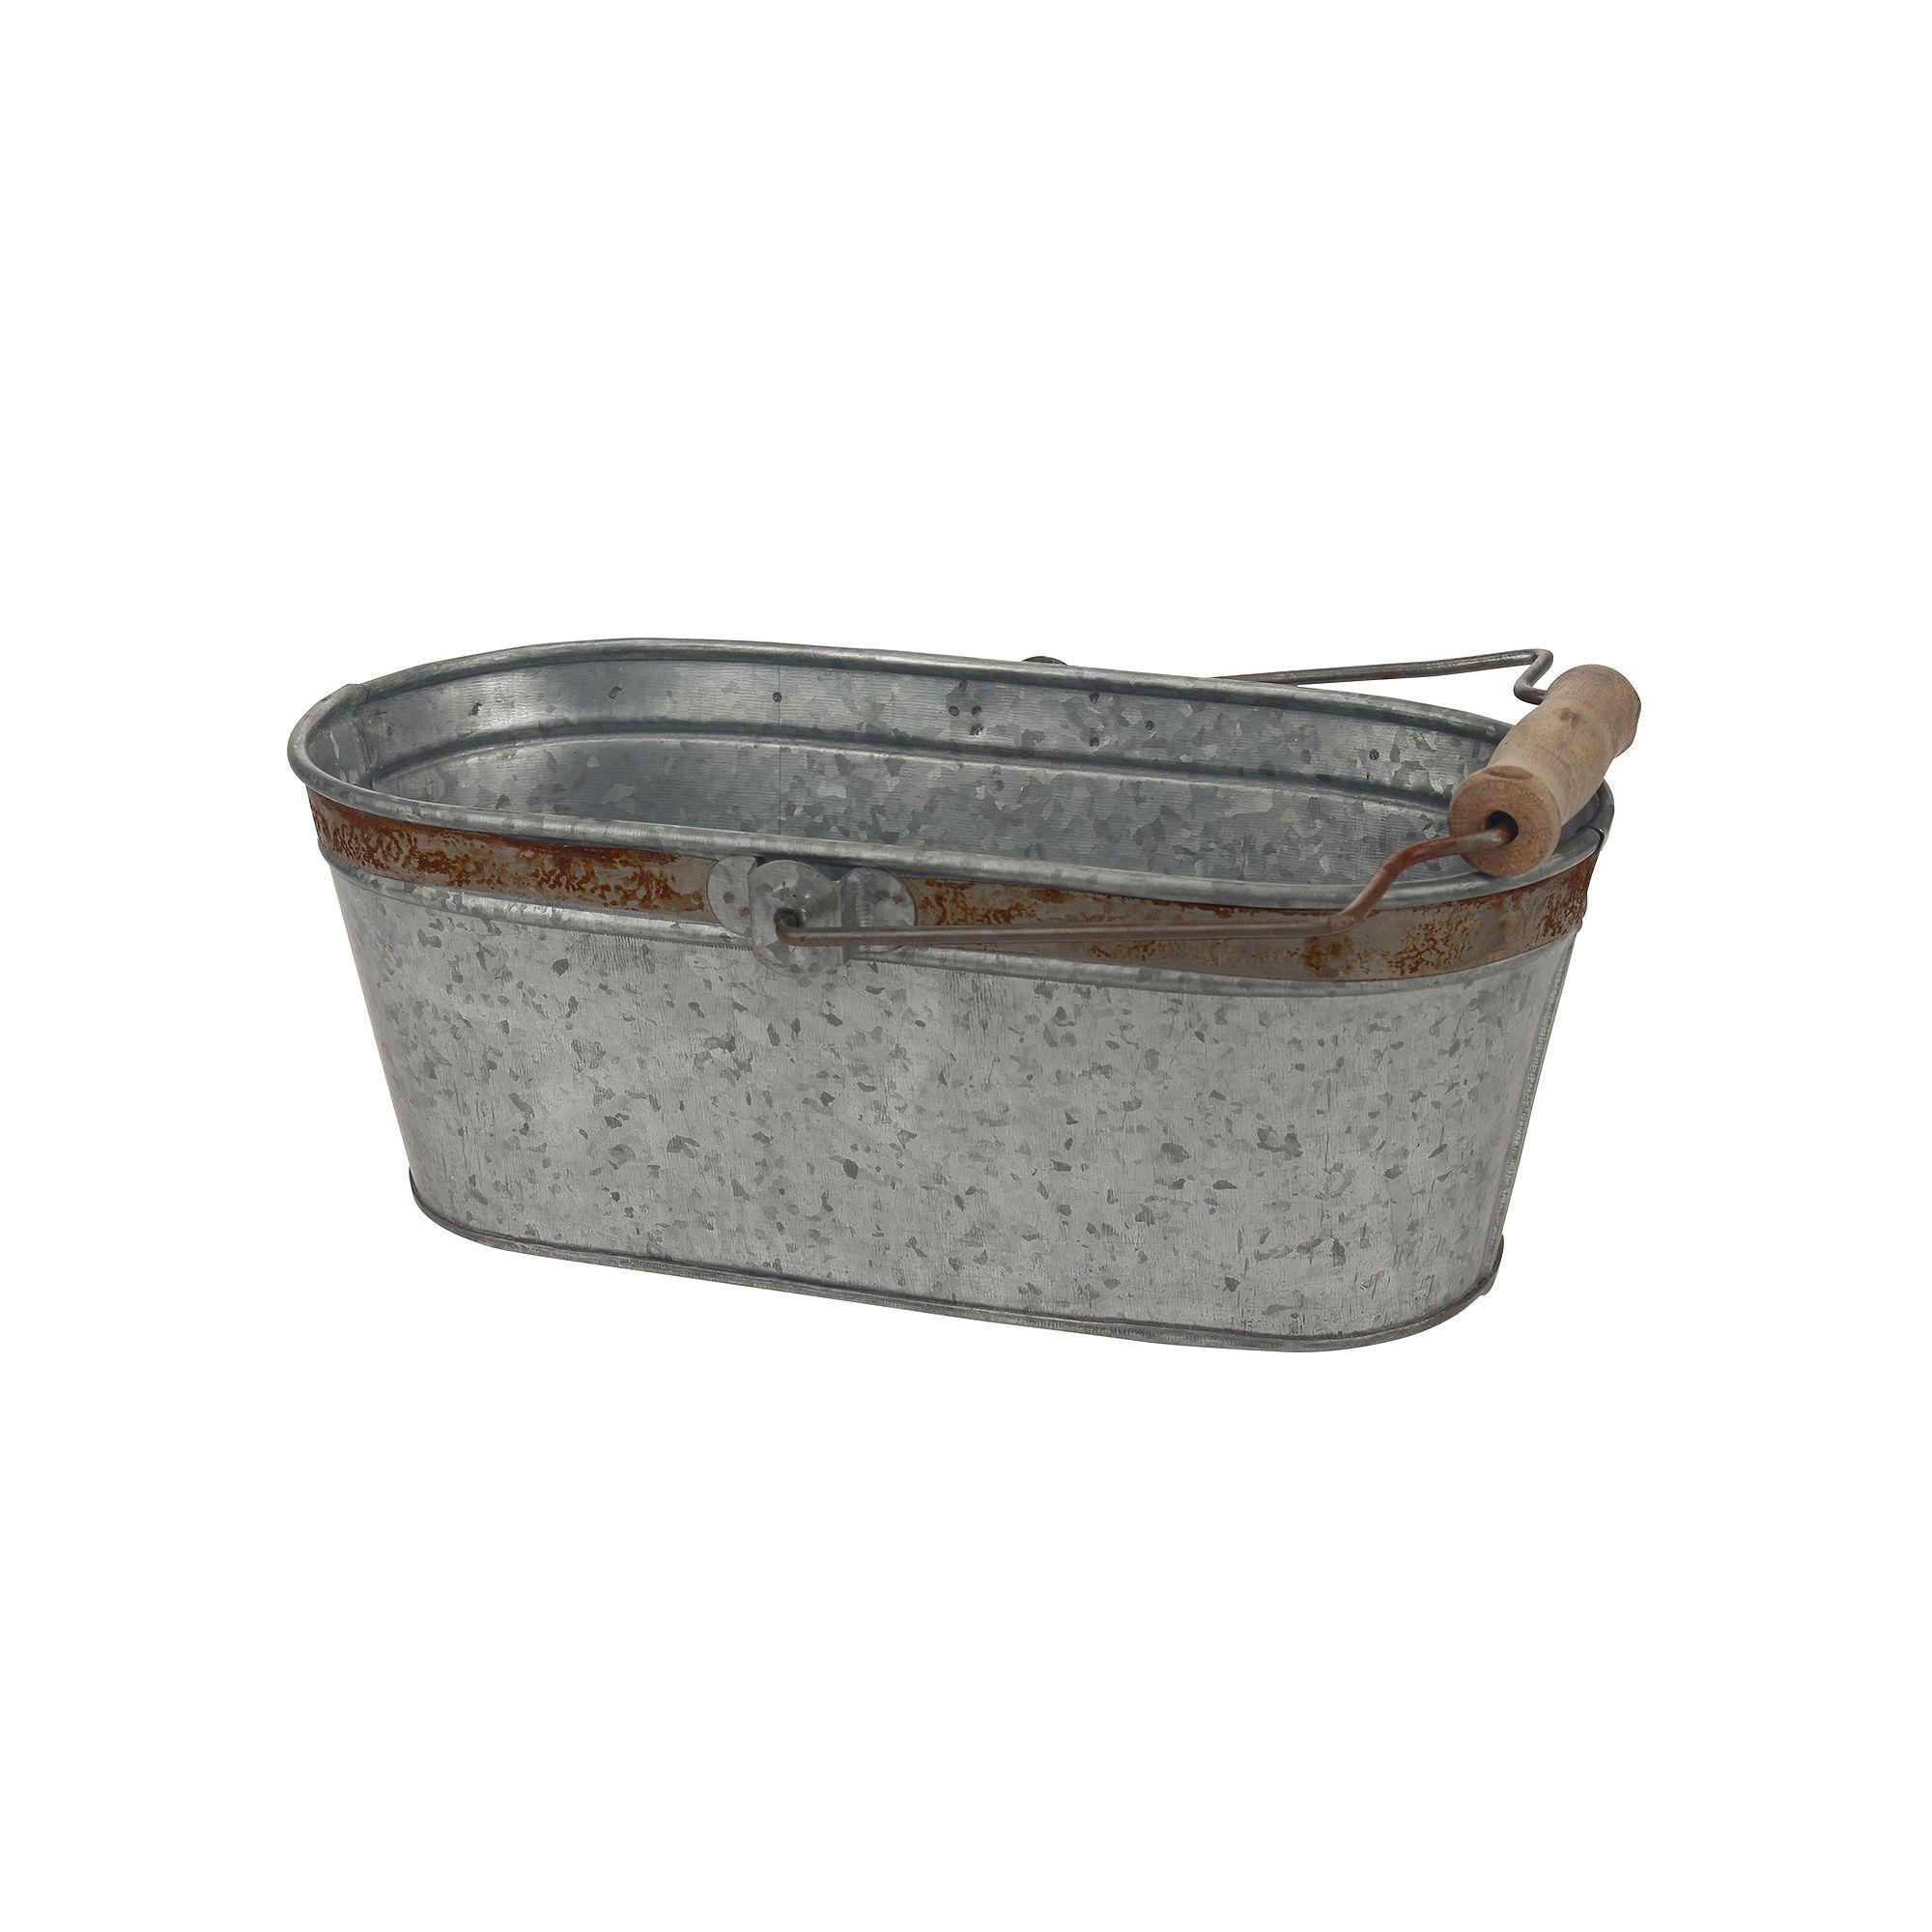 Galvanized Metal Oval Tub Beverage Tub Galvanized Tub Galvanized Buckets